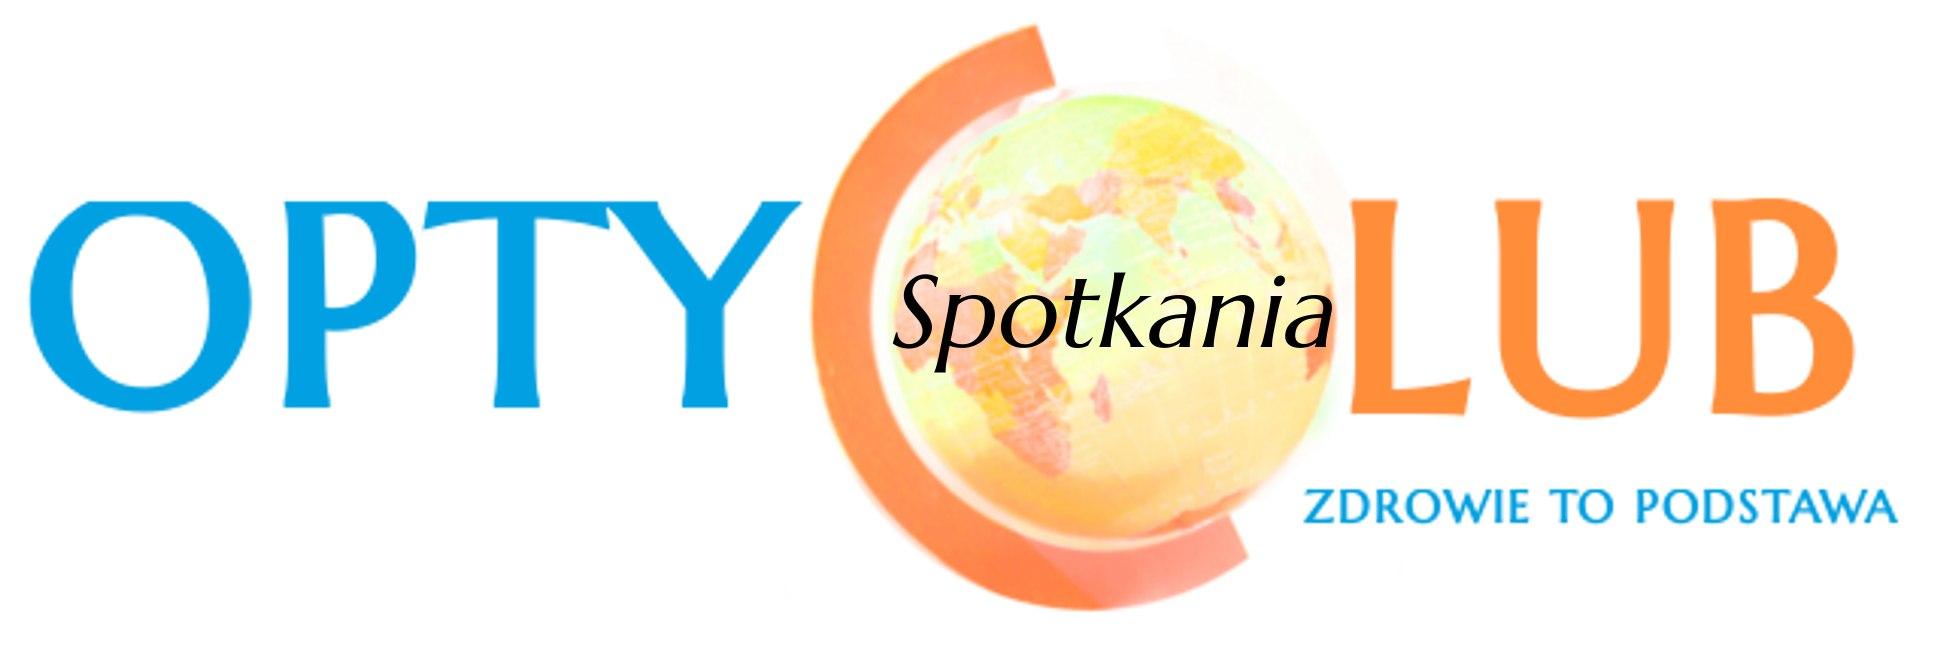 https://www.kraus-system.pl/wp-content/uploads/2019/01/OptyClublogo-spotkaniaJPG.jpg